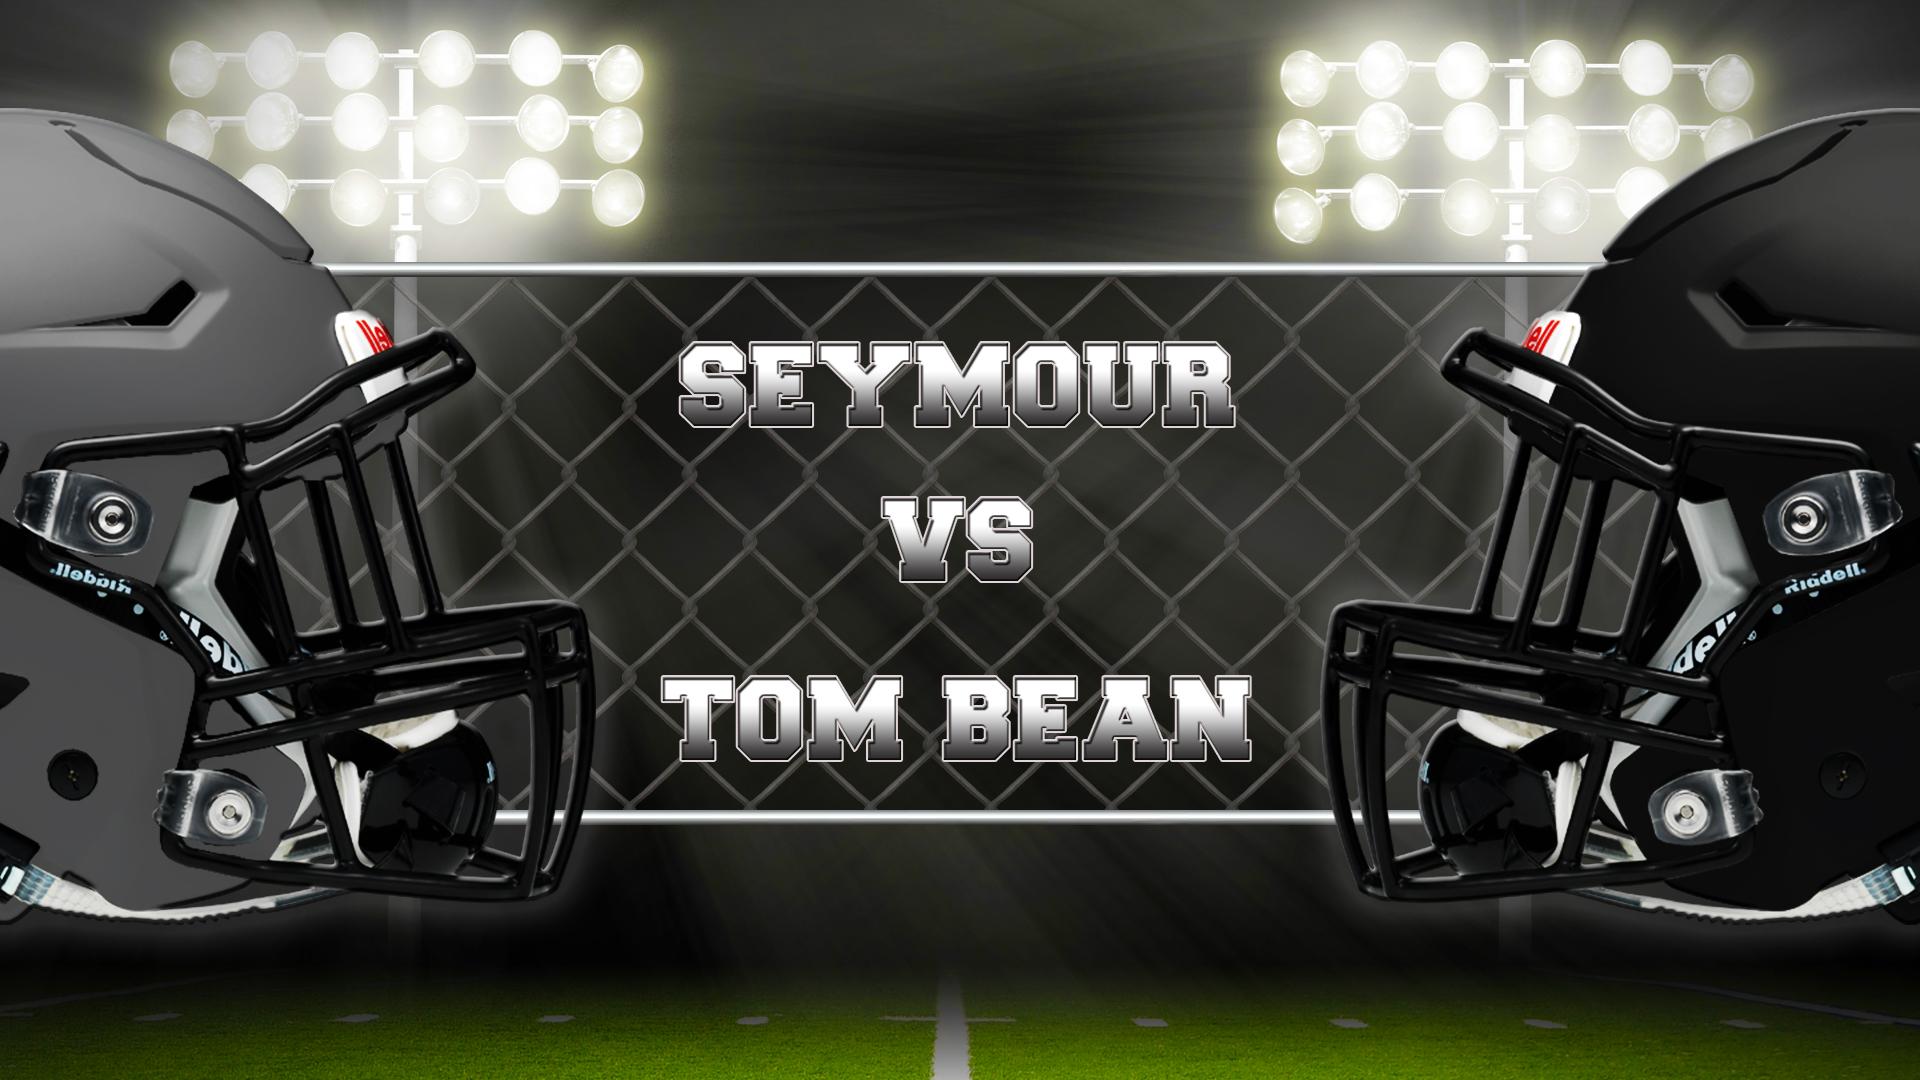 Seymour vs Tom Bean_1478873804197.jpg